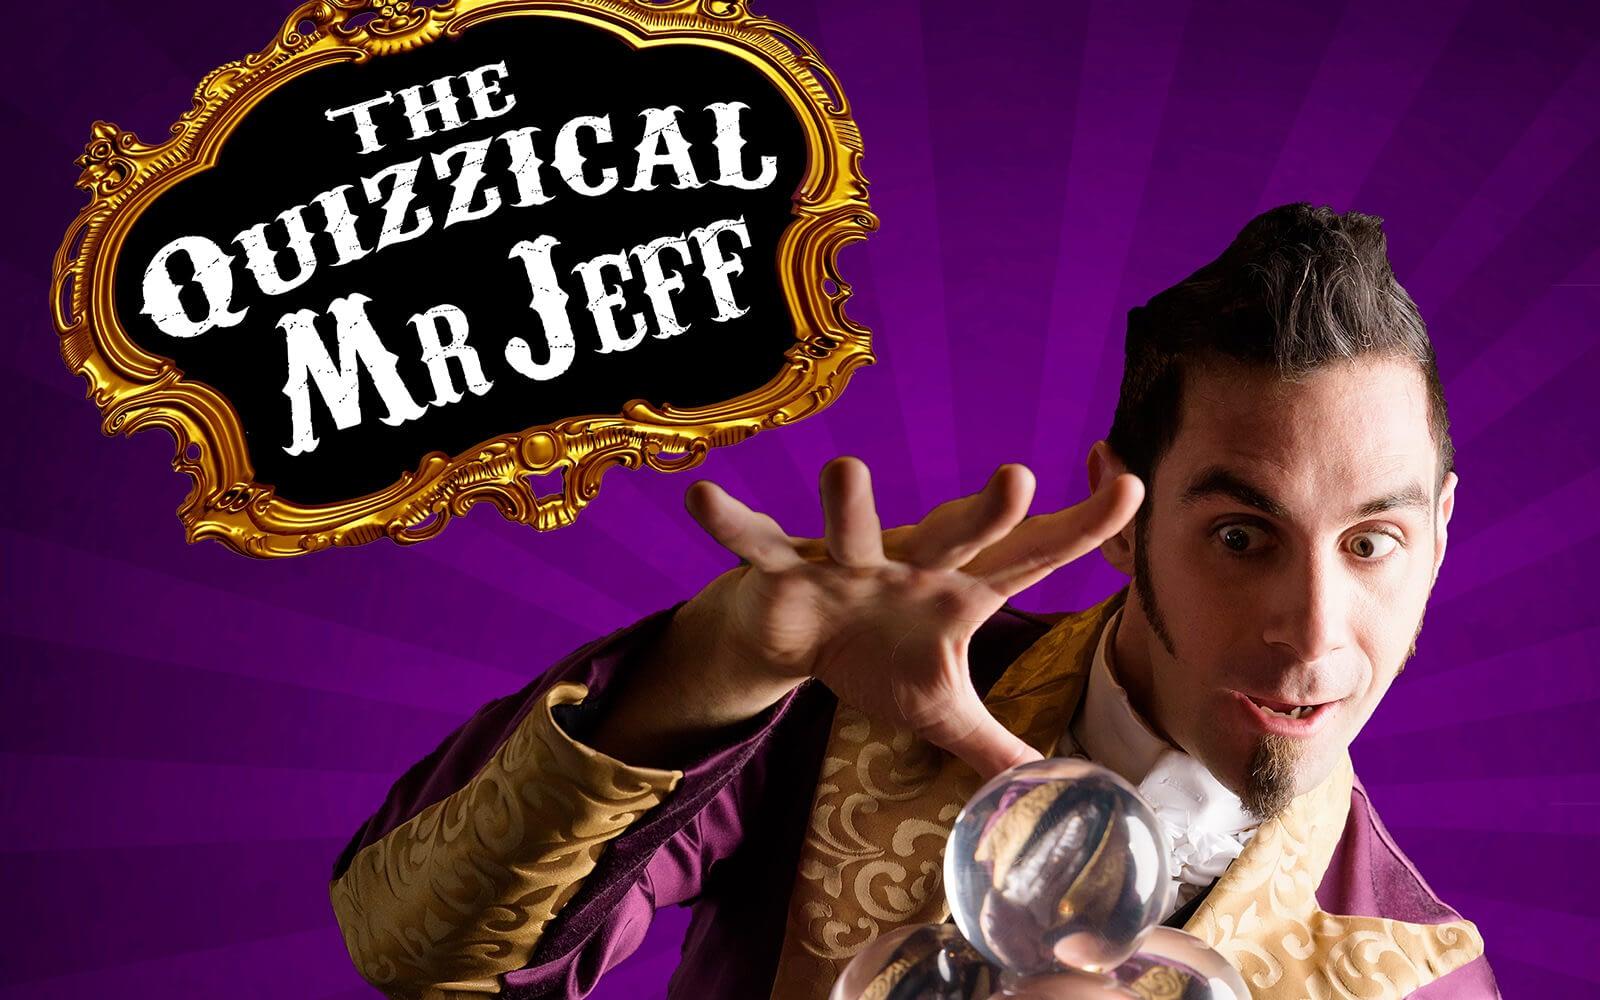 The Quizzical Mr Jeff_The Quizzical Mr Jeff_Portrait